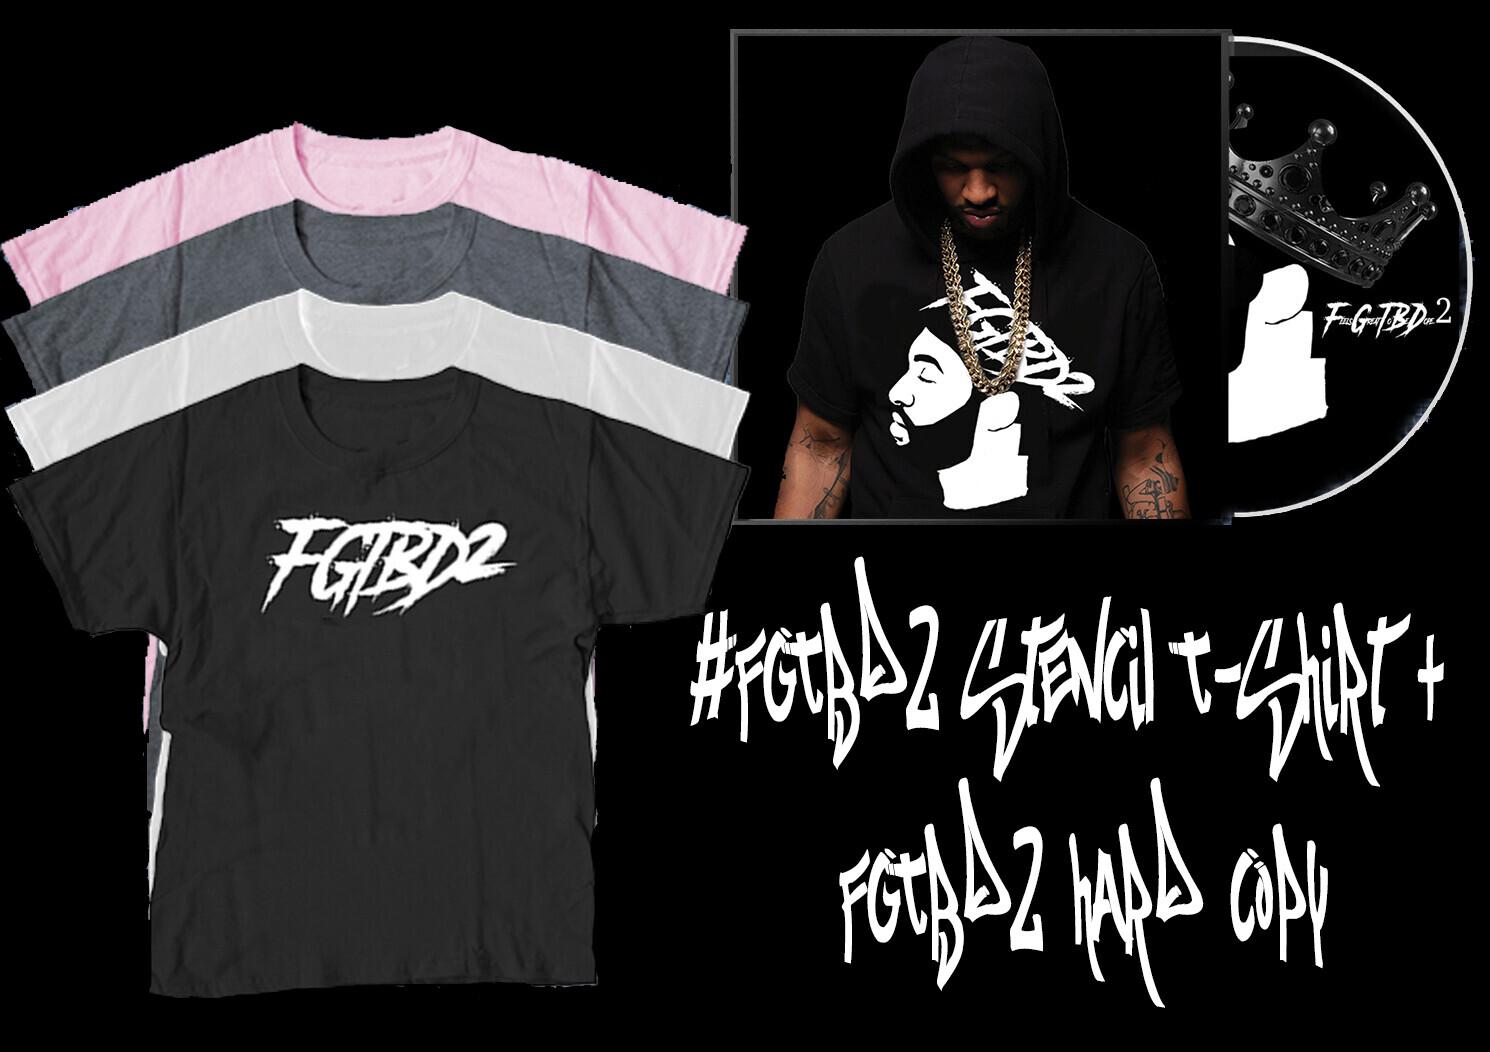 ($33 OFF) #FGTBD2 T-Shirt + FGTBD2 Hard Copy + FREE GIFT